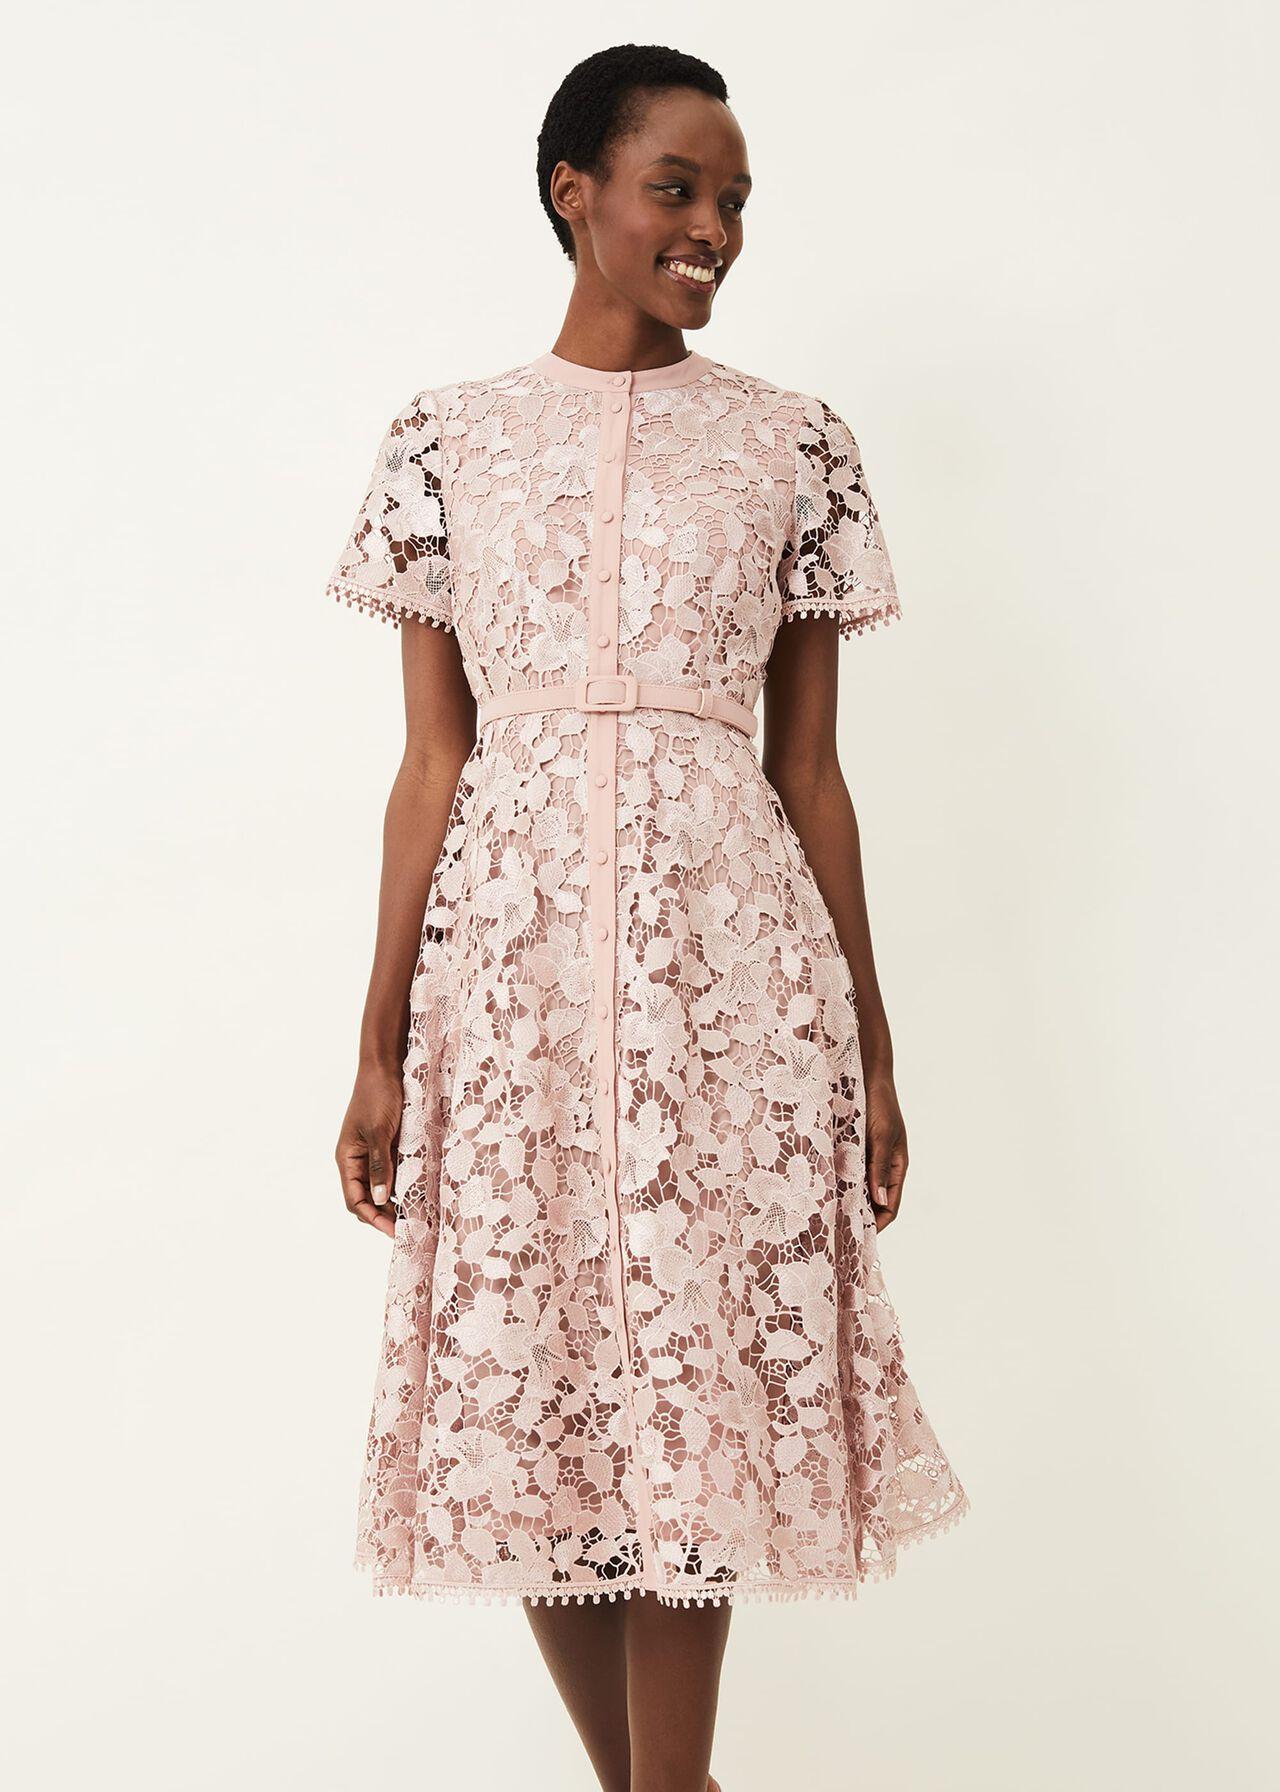 Samana Lace Shirt Dress